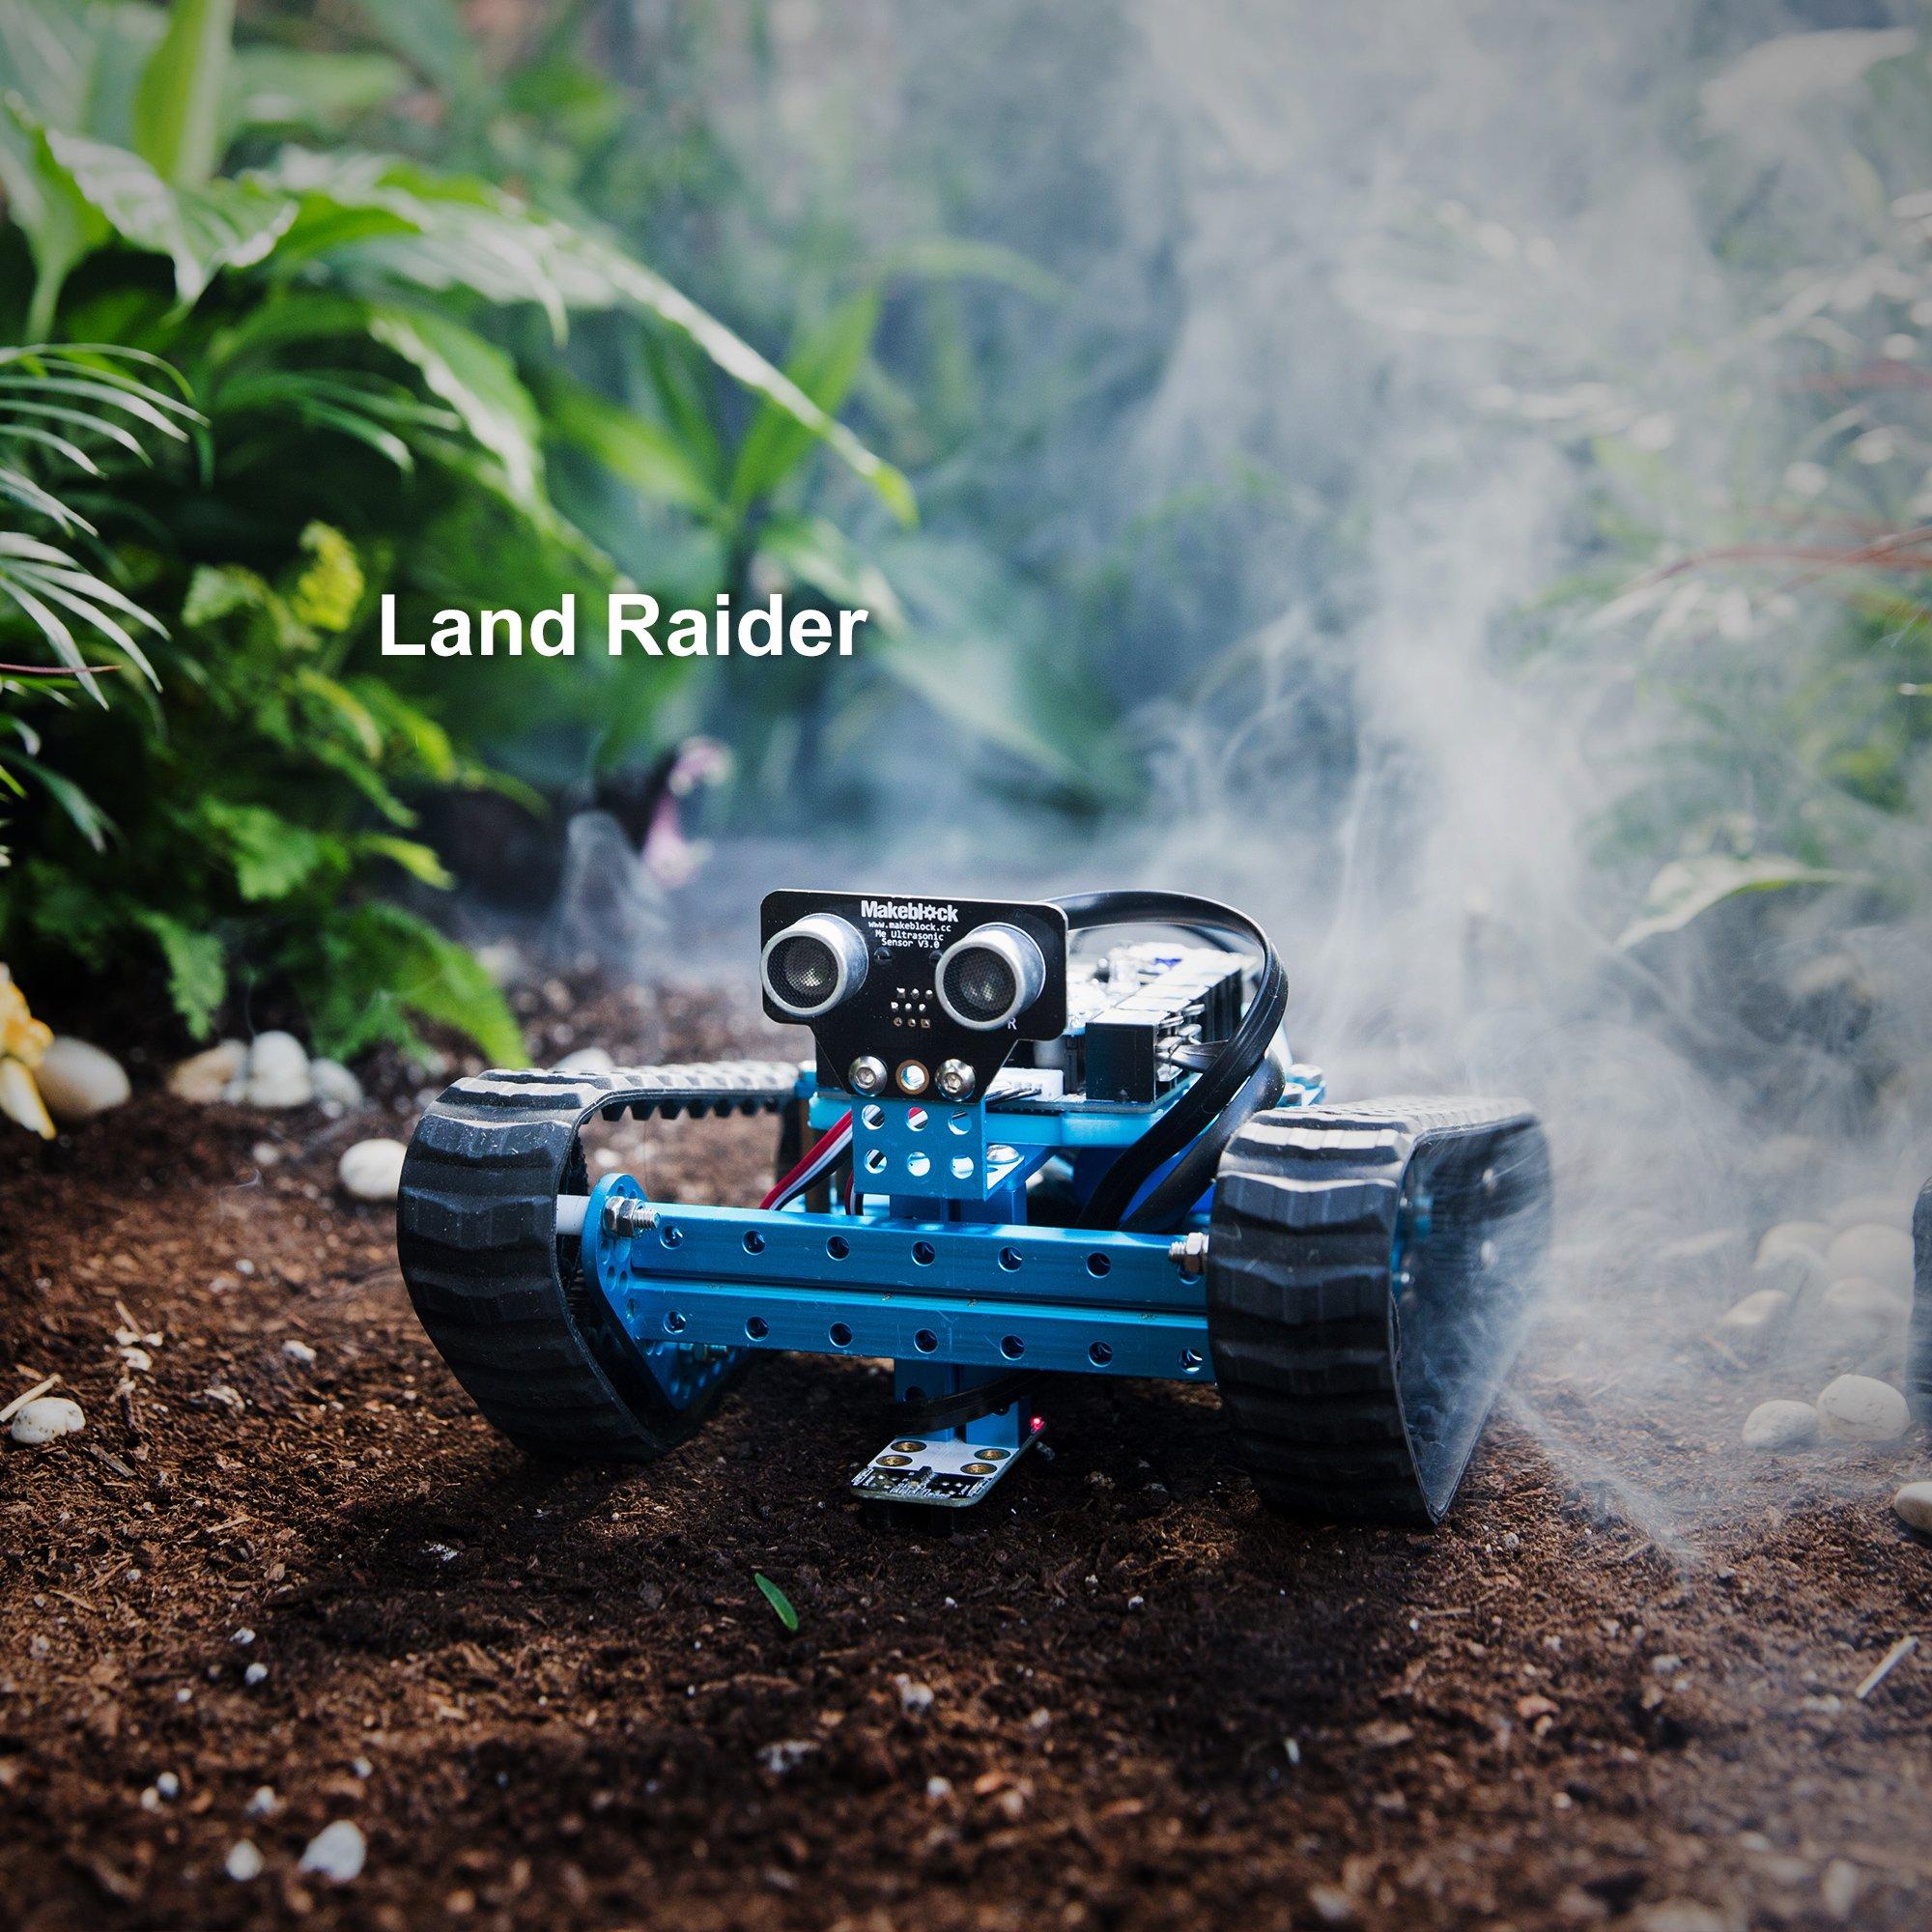 Makeblock Programmable mBot Ranger Robot Kit, STEM Educational Engineering Design & Build 3 in 1 Programmable Robotic System Kit - Ages 10+ by Makeblock (Image #2)